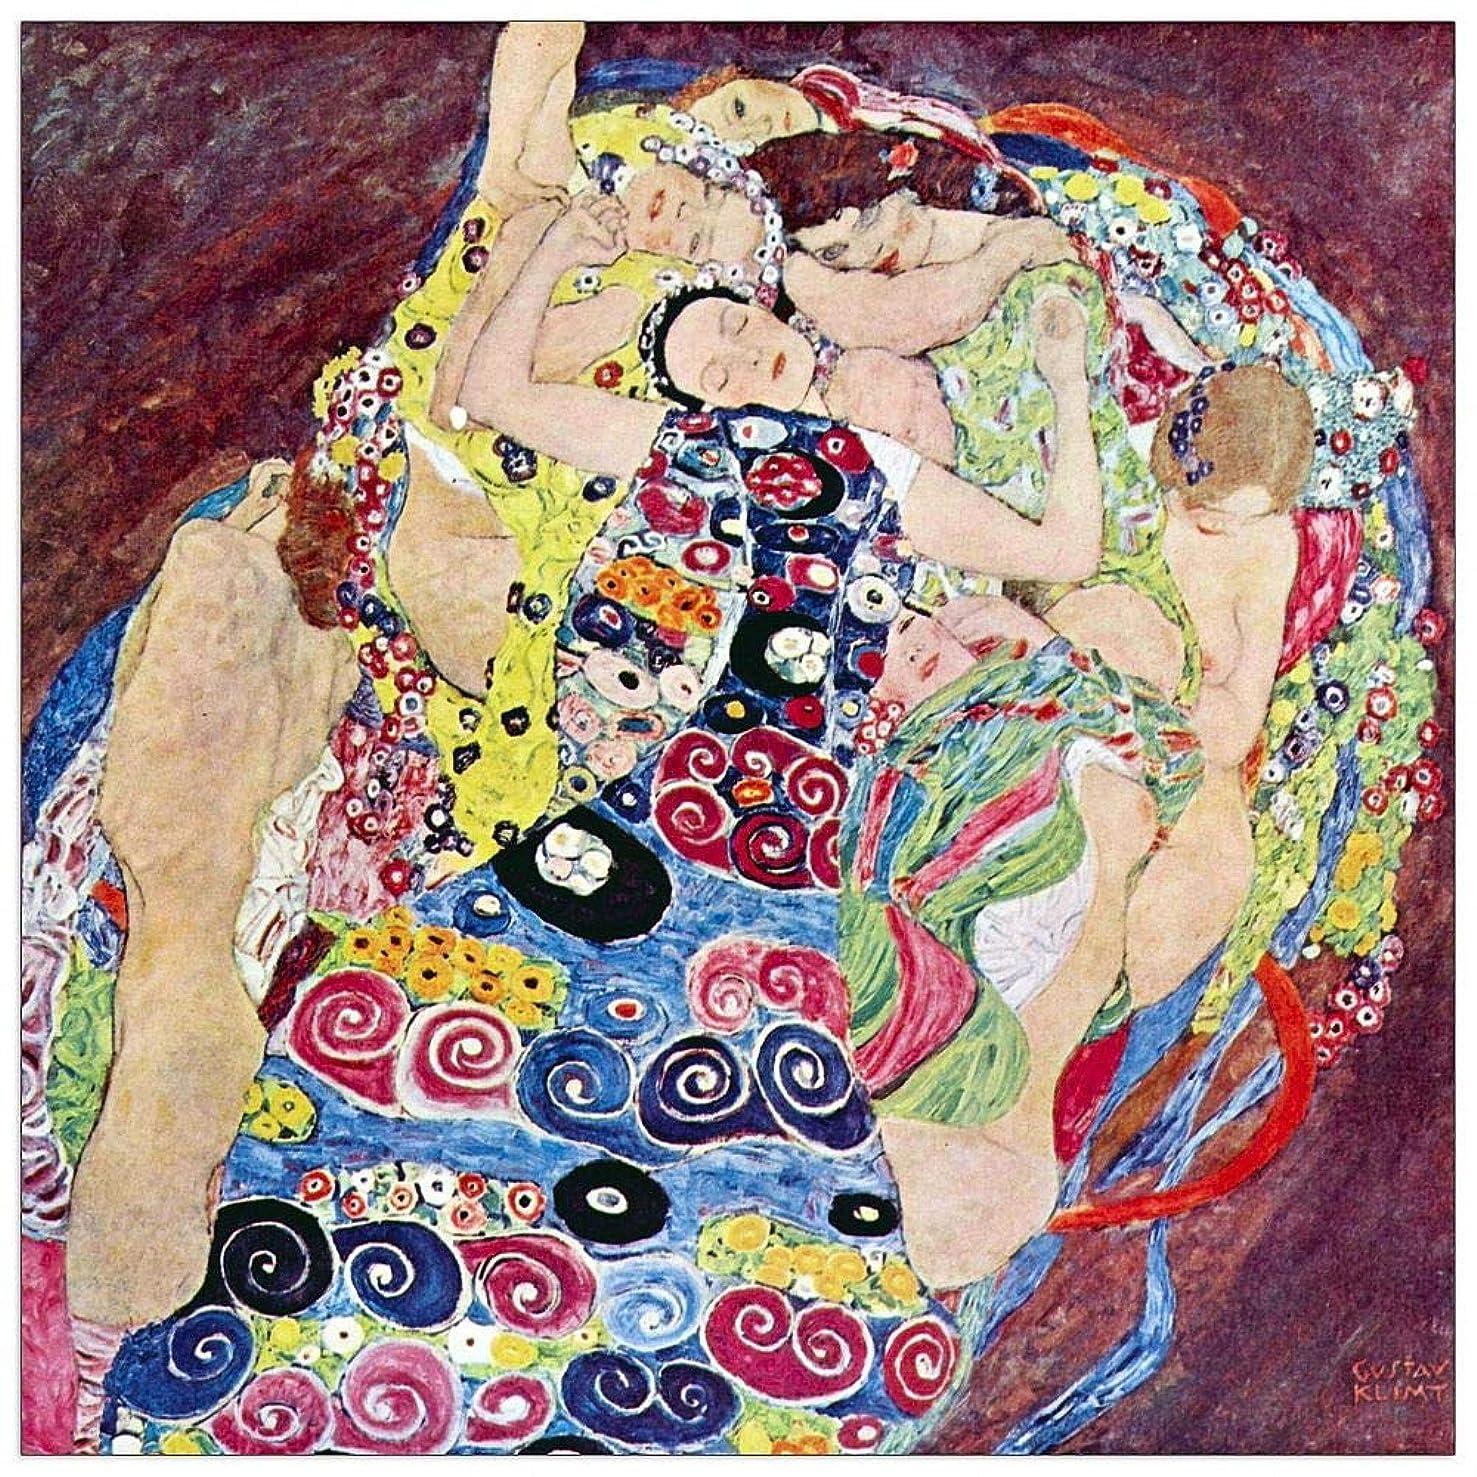 ArtPlaza TW90508 Klimt Gustav - Virgins Decorative Panel 31.5x31.5 Inch Multicolored